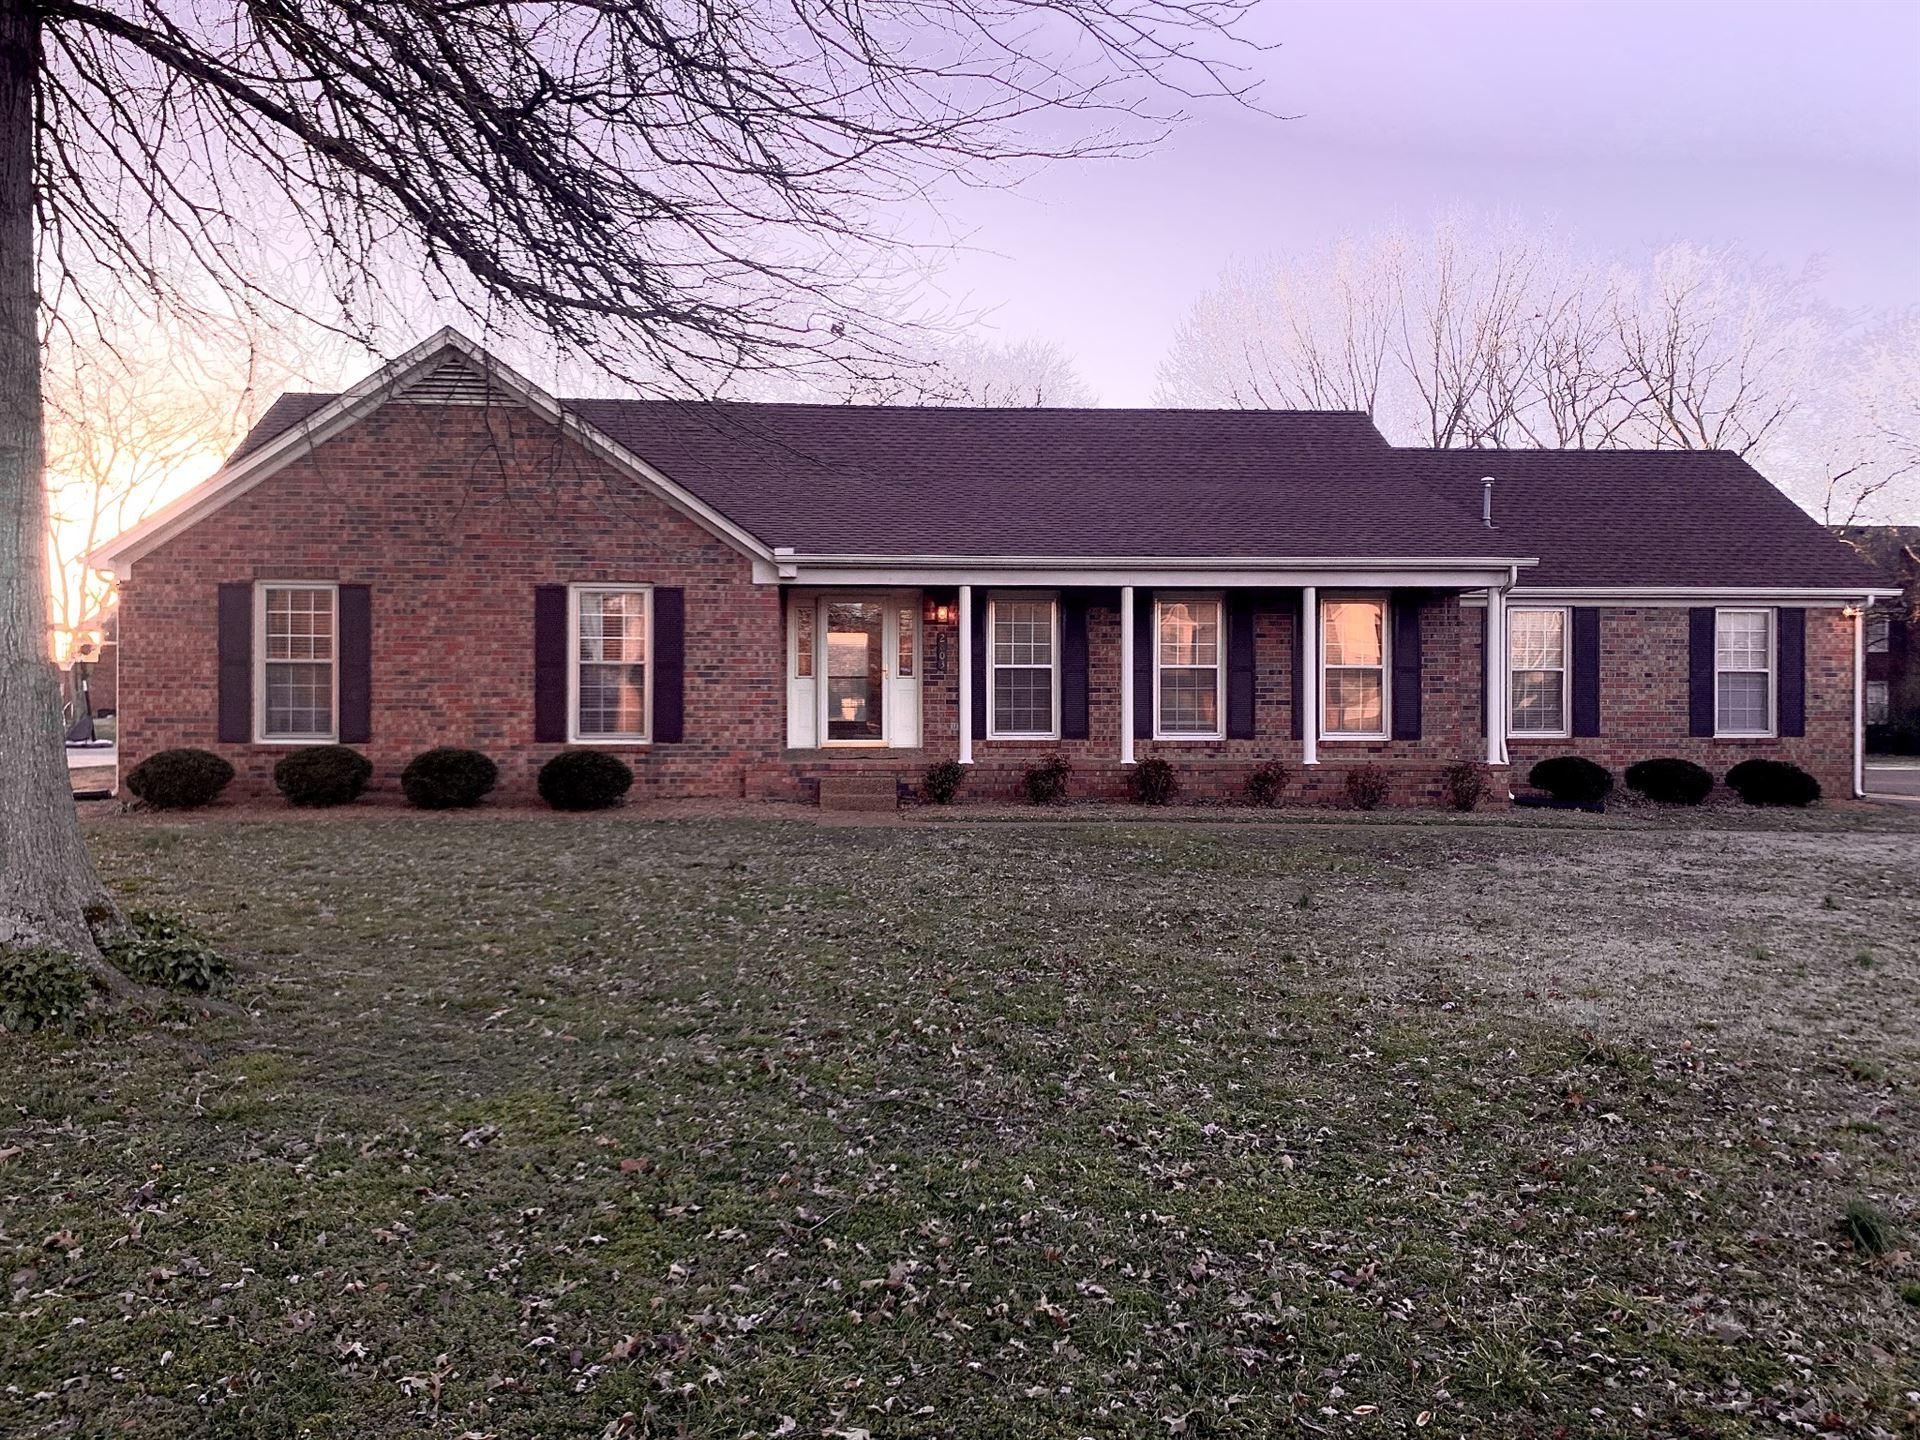 2803 Palace Pl, Murfreesboro, TN 37129 - MLS#: 2230530